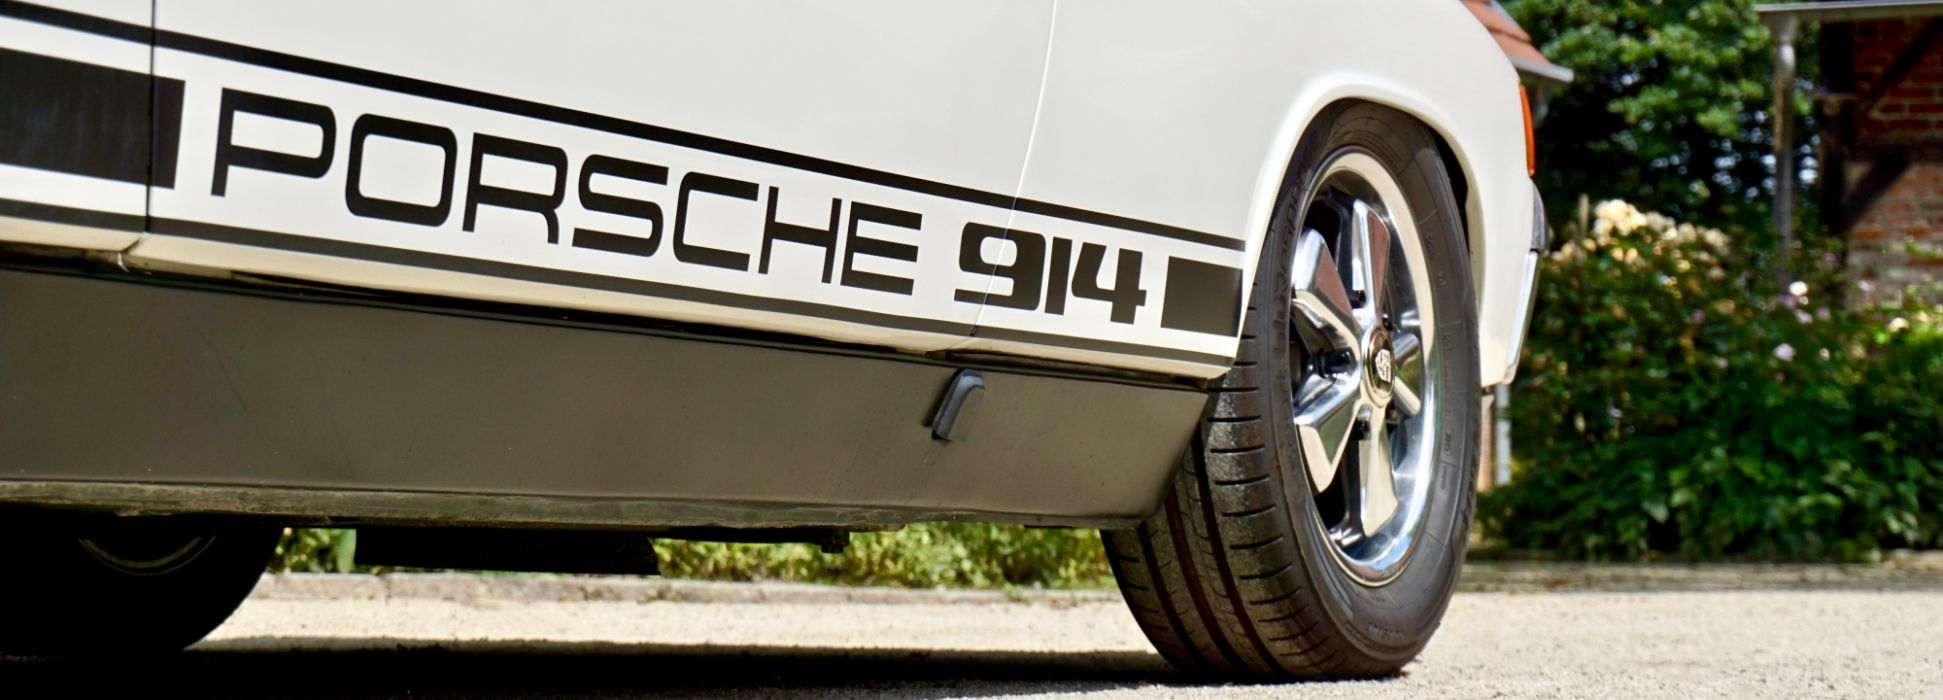 VW-Porsche 914 2.0 / 47 8